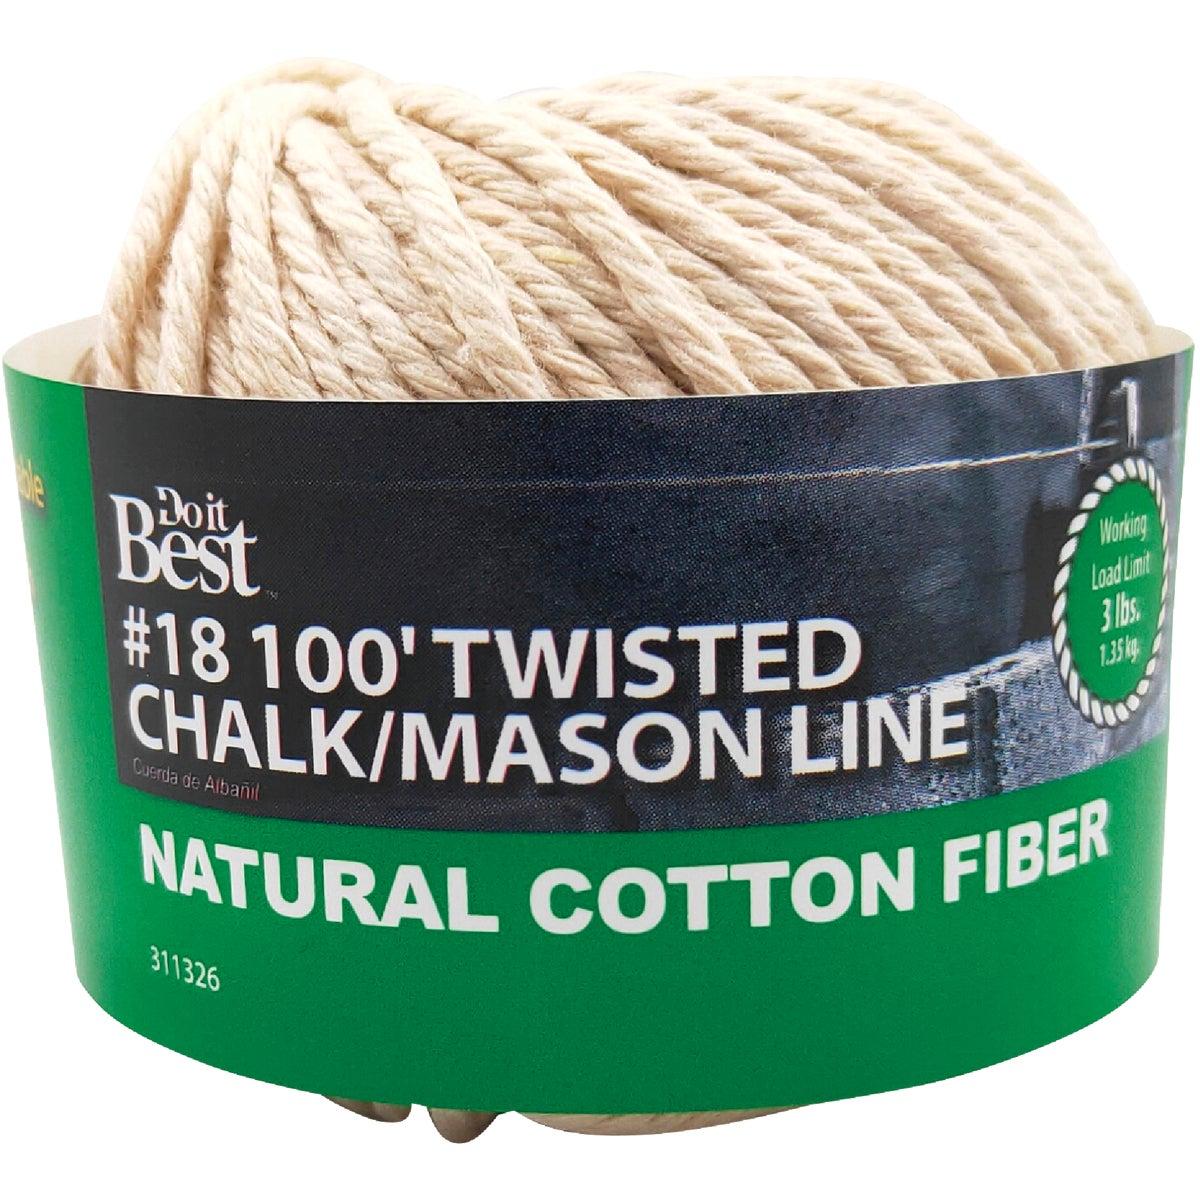 100' CHALK & MASON LINE - 311326 by Do it Best